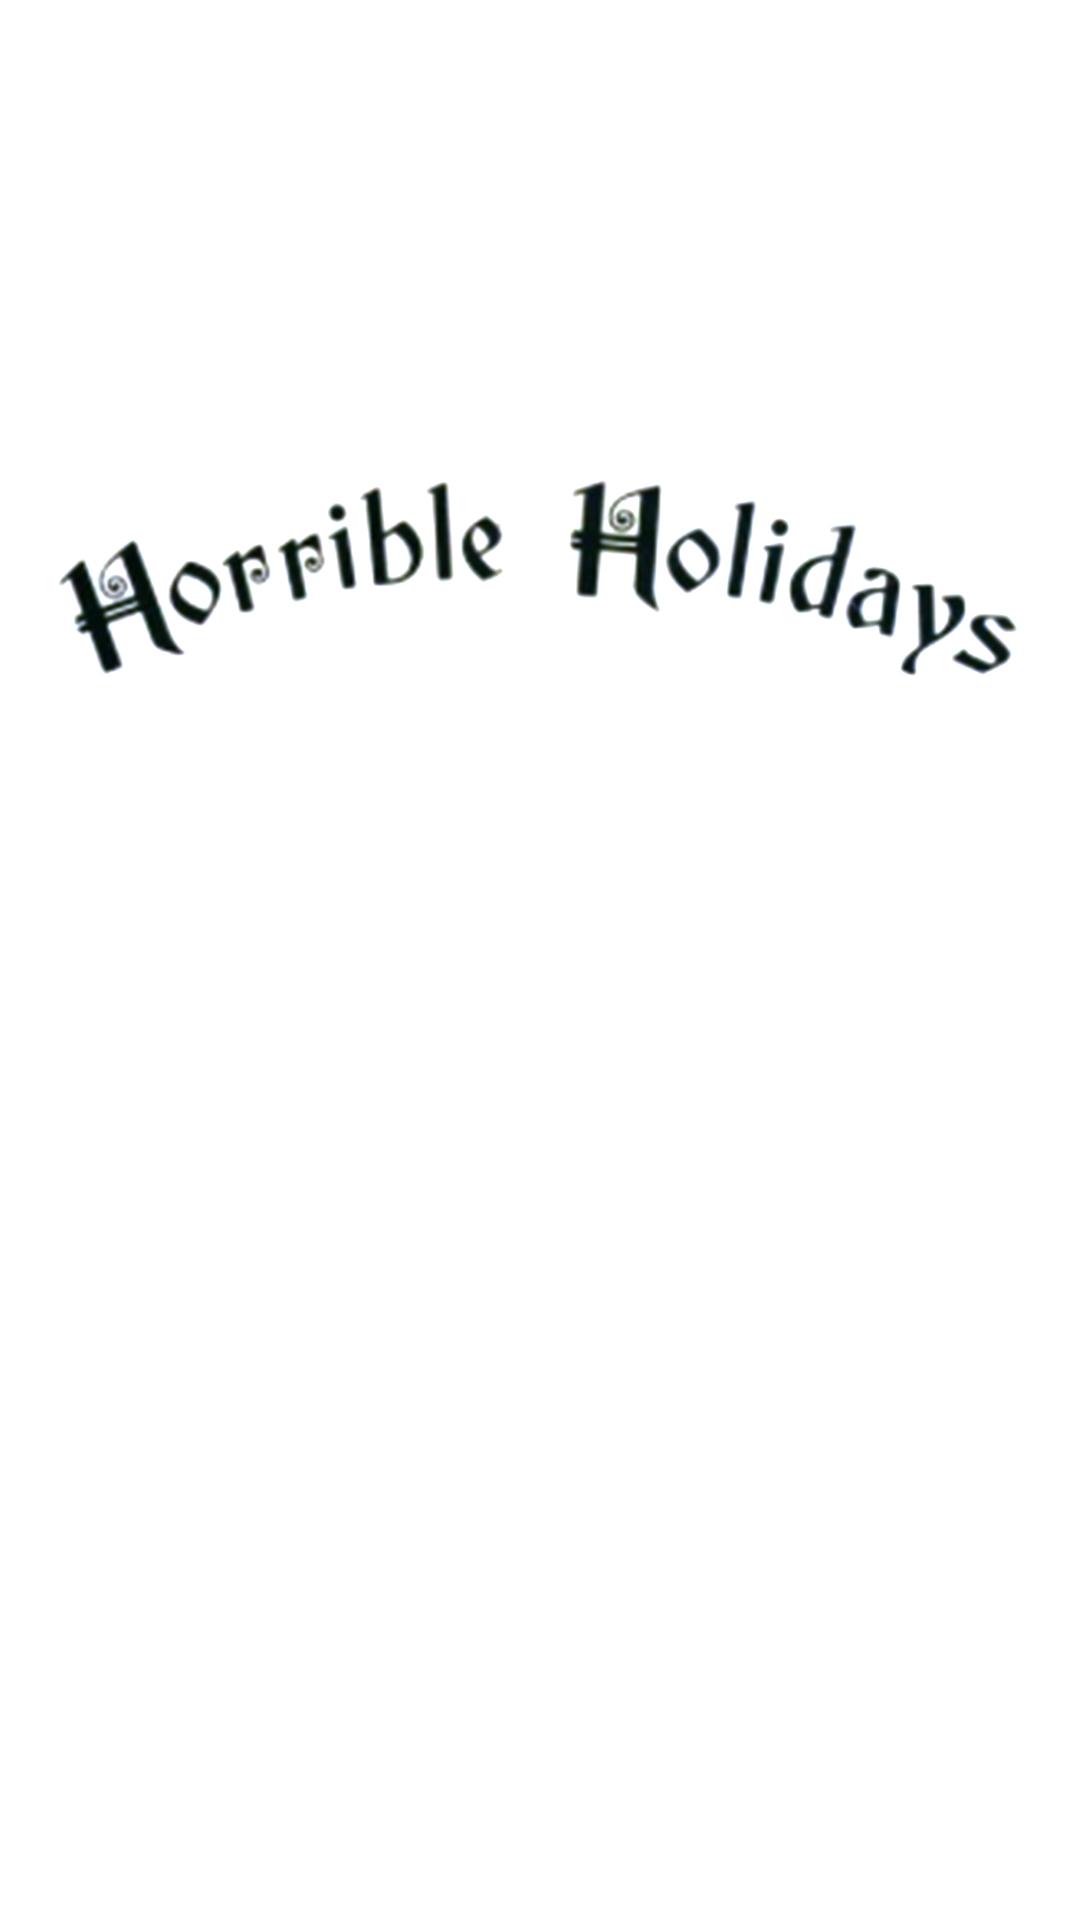 horribleholidays.jpg